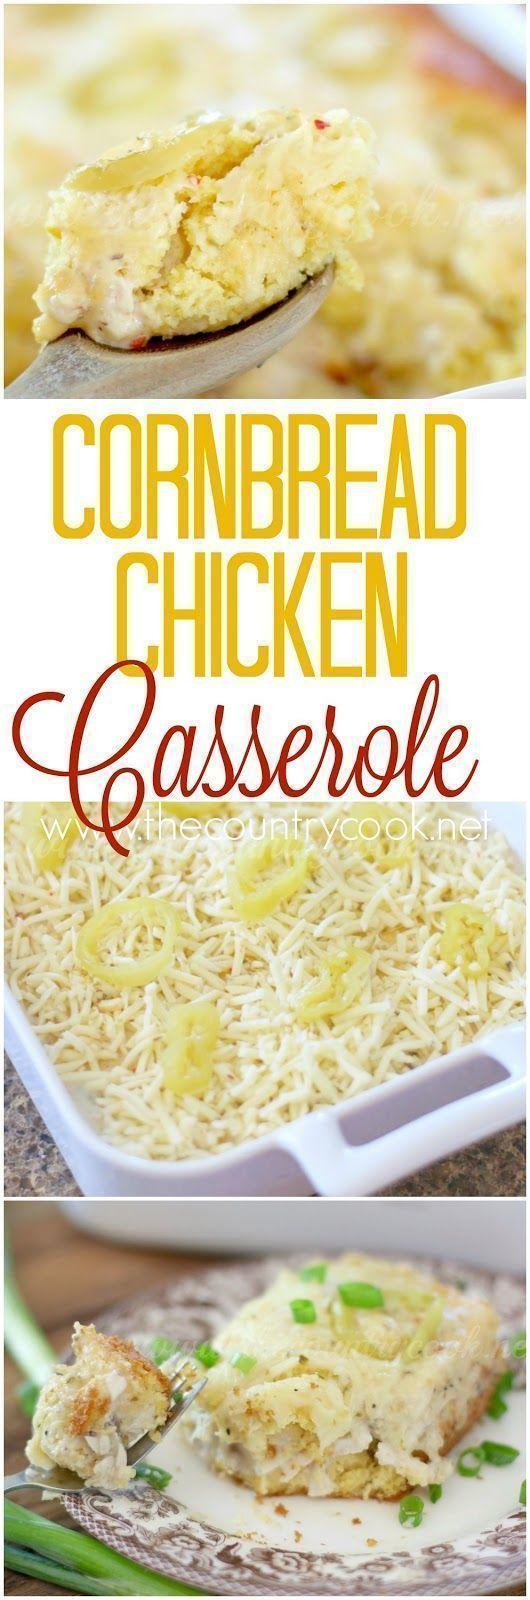 Cornbread Chicken Casserole #creamychickencasserole